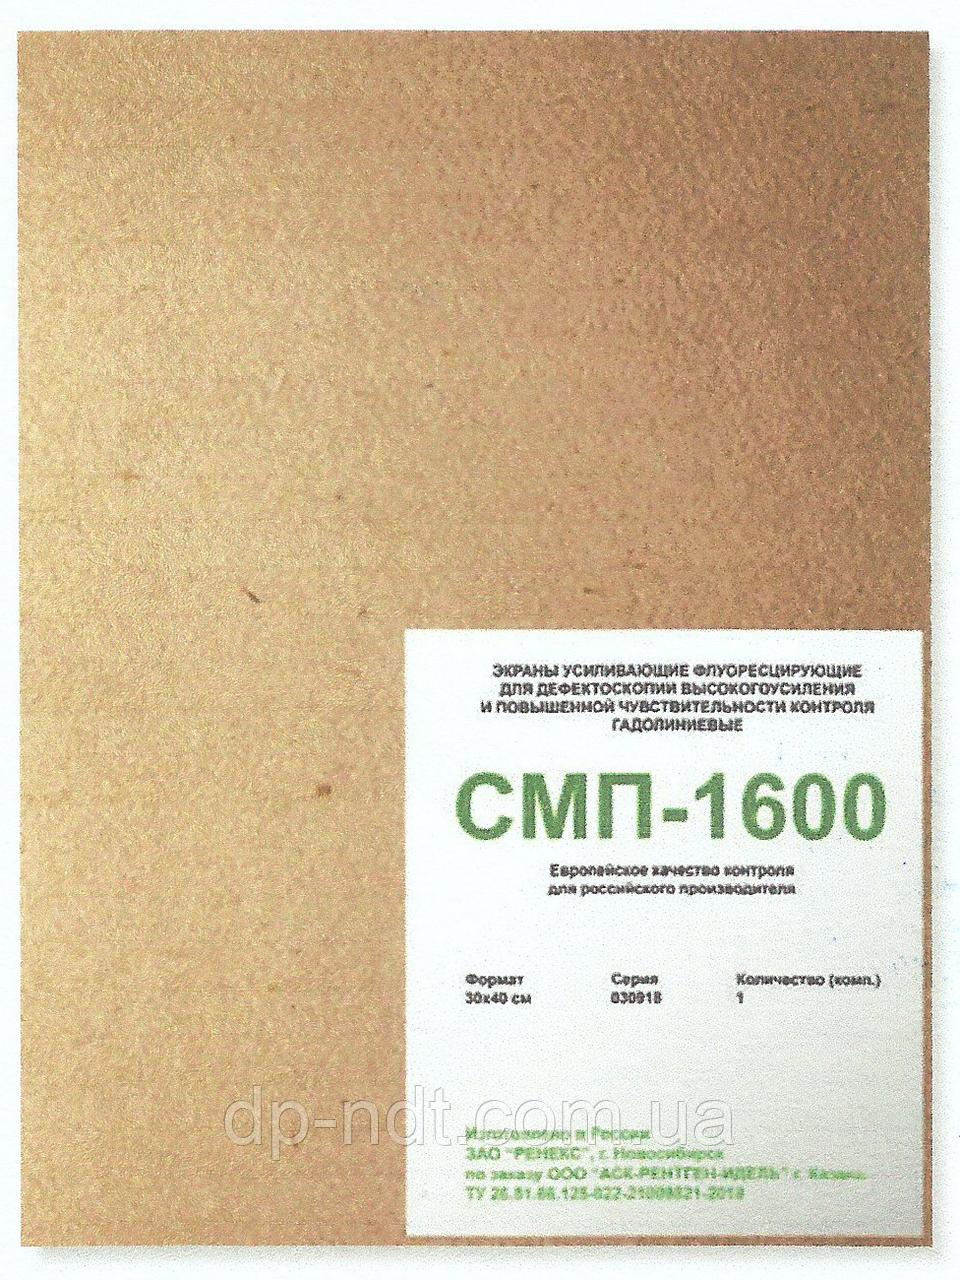 Усиливающий экран СМП-1600, флуоресцирующий